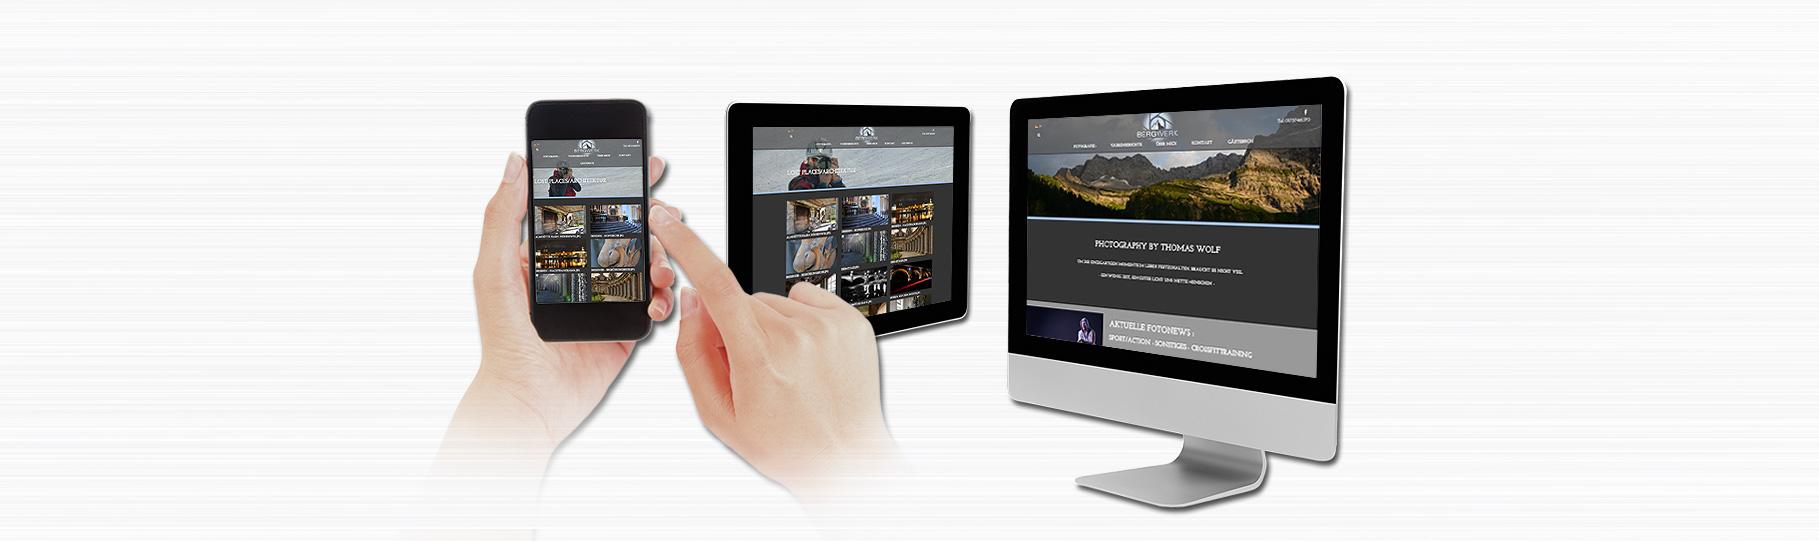 web screendesign alimonti hoffmann werbeagentur. Black Bedroom Furniture Sets. Home Design Ideas